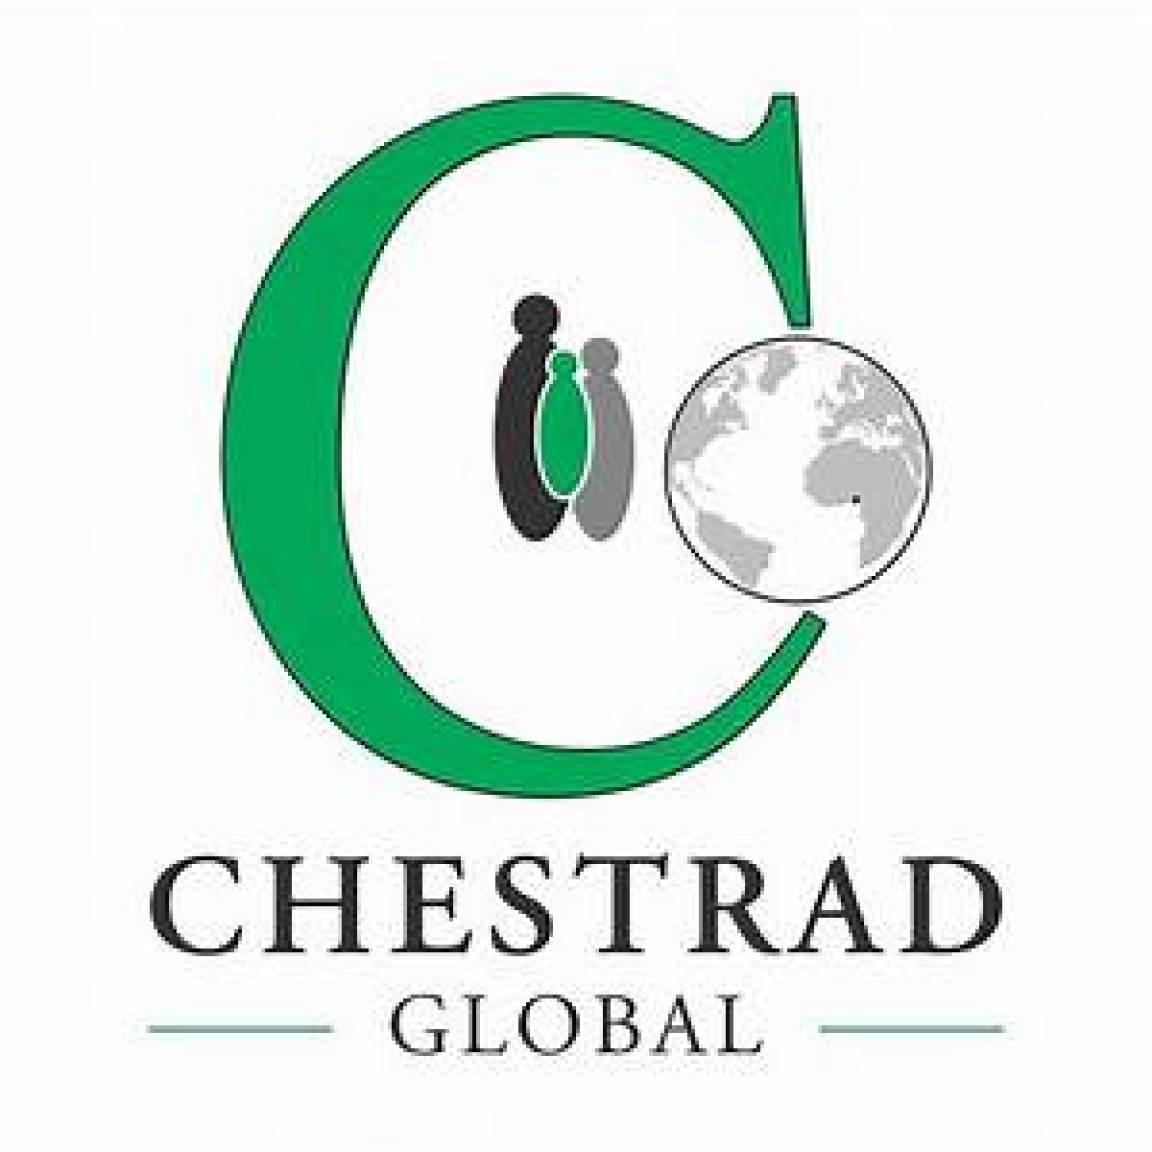 chestrad